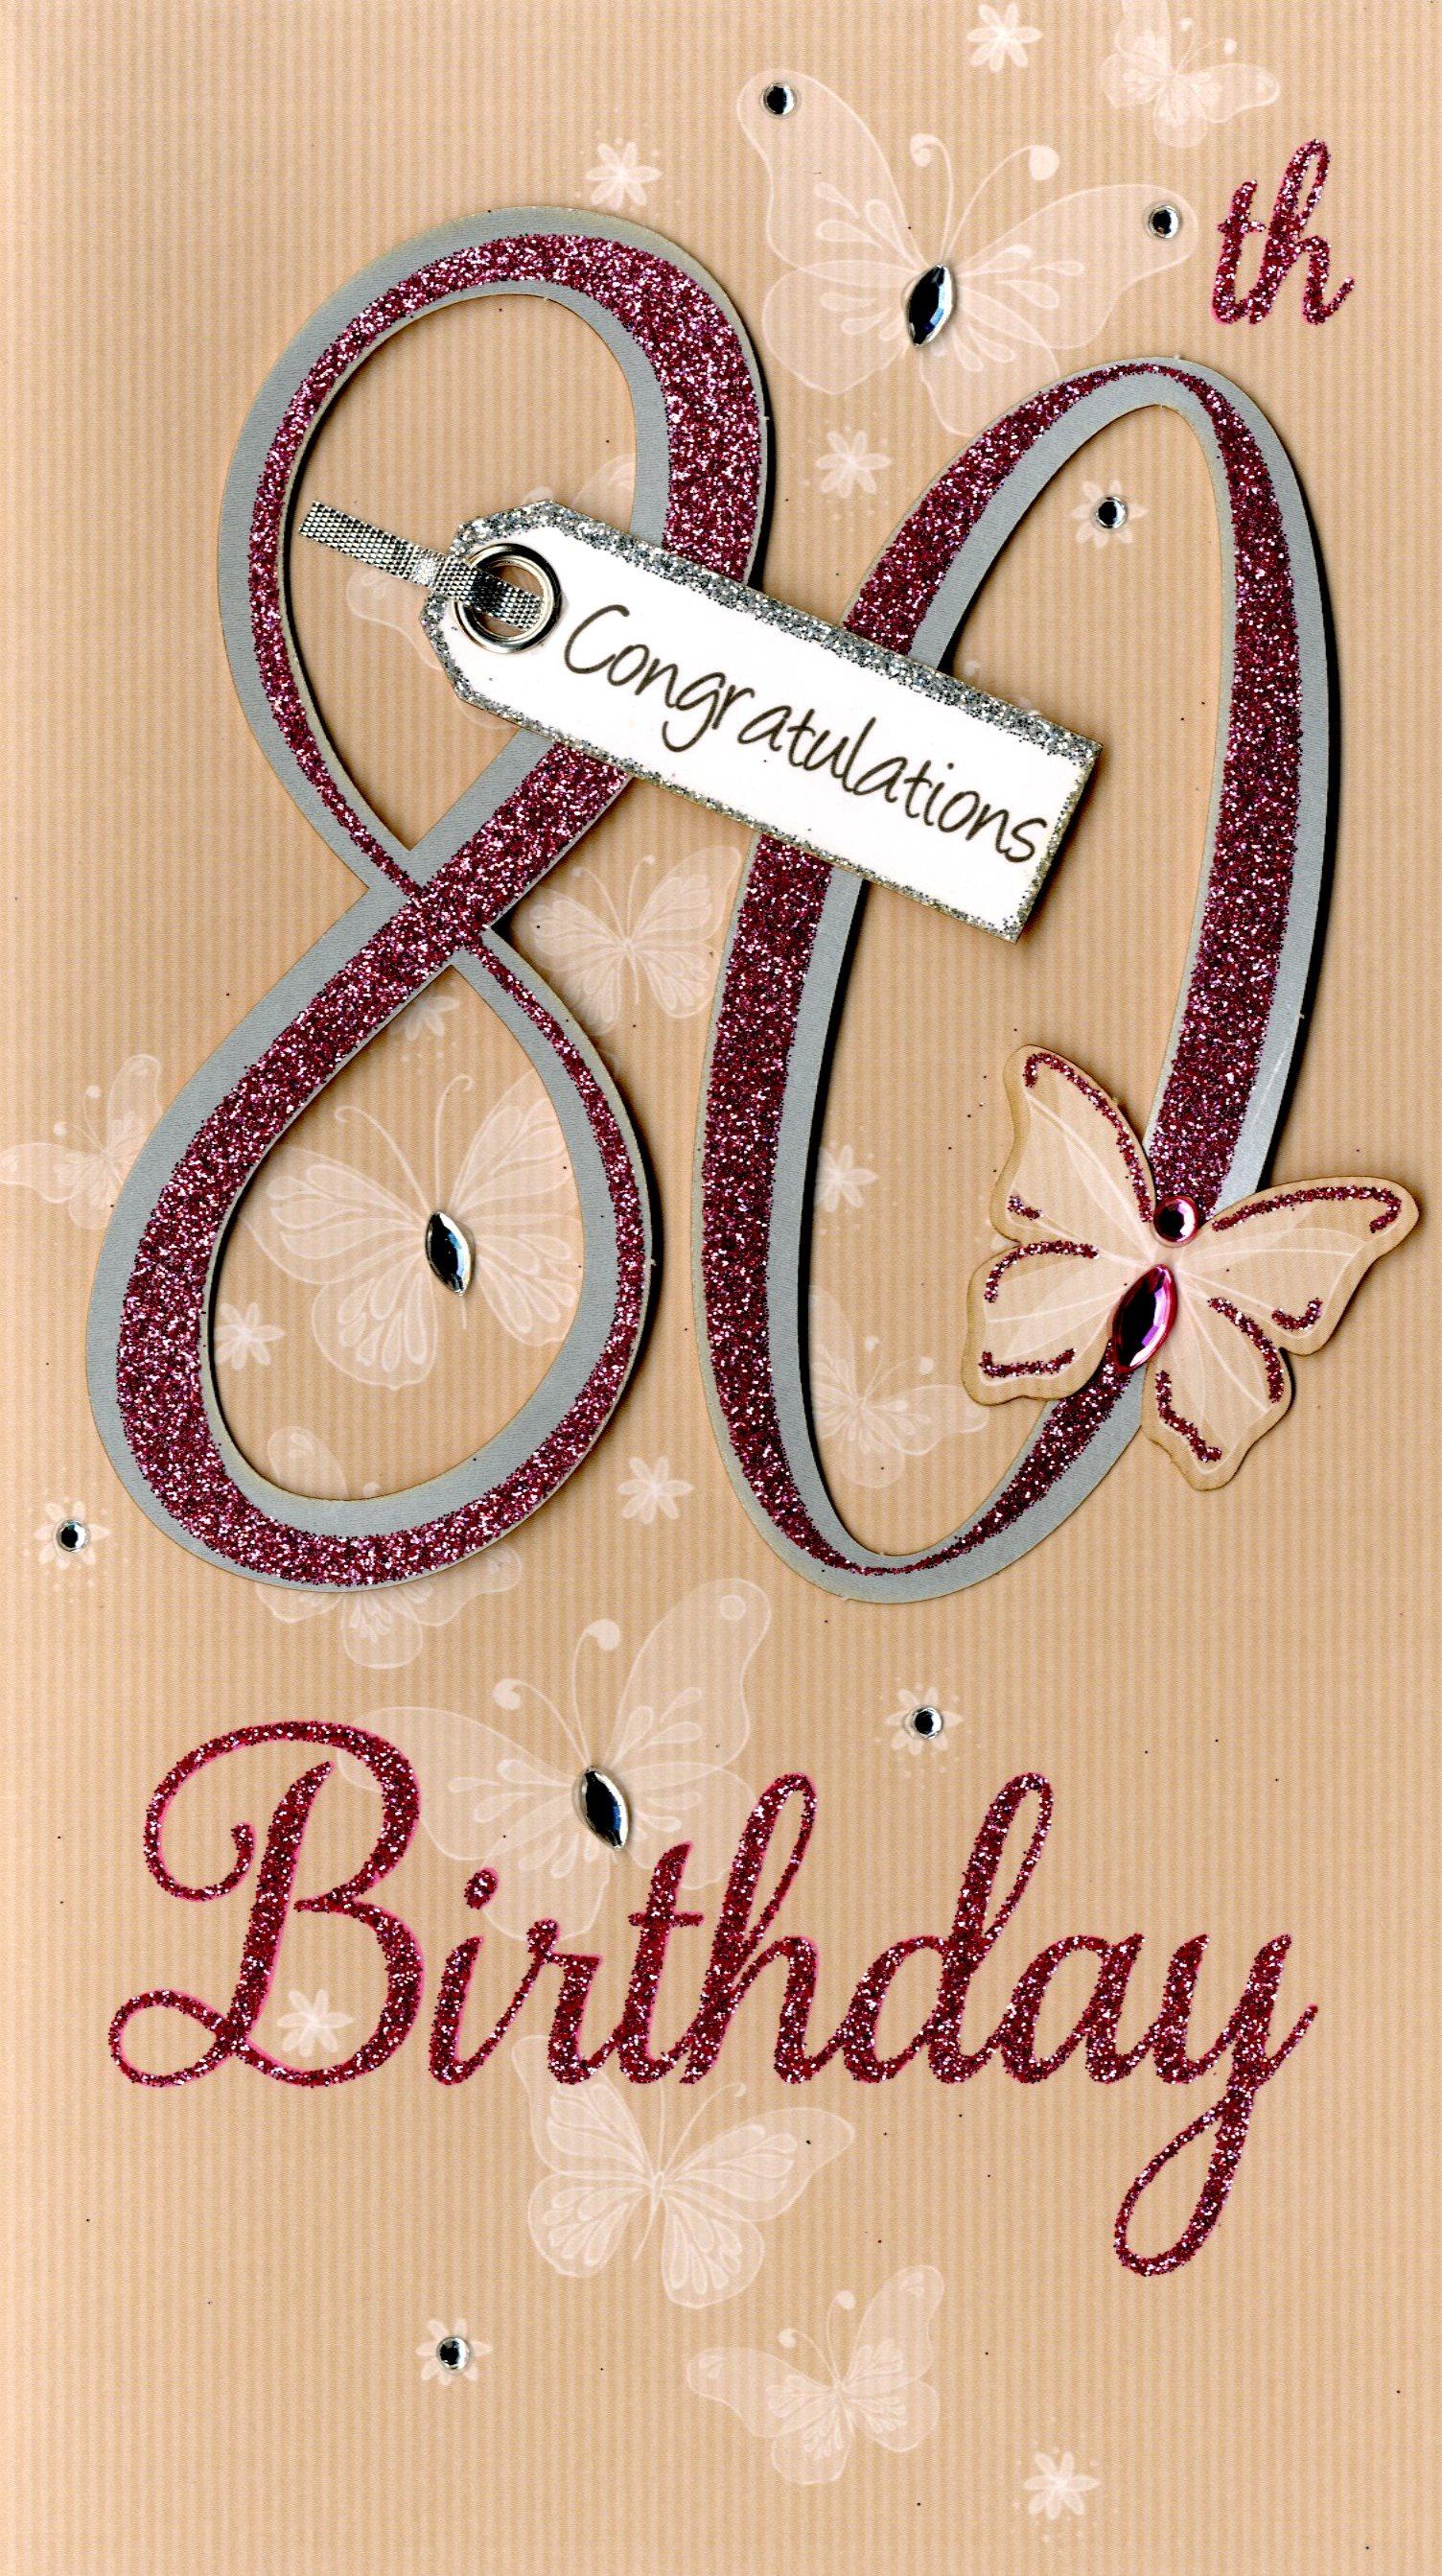 Happy 80th birthday greeting card cards love kates happy 80th birthday greeting card bookmarktalkfo Choice Image